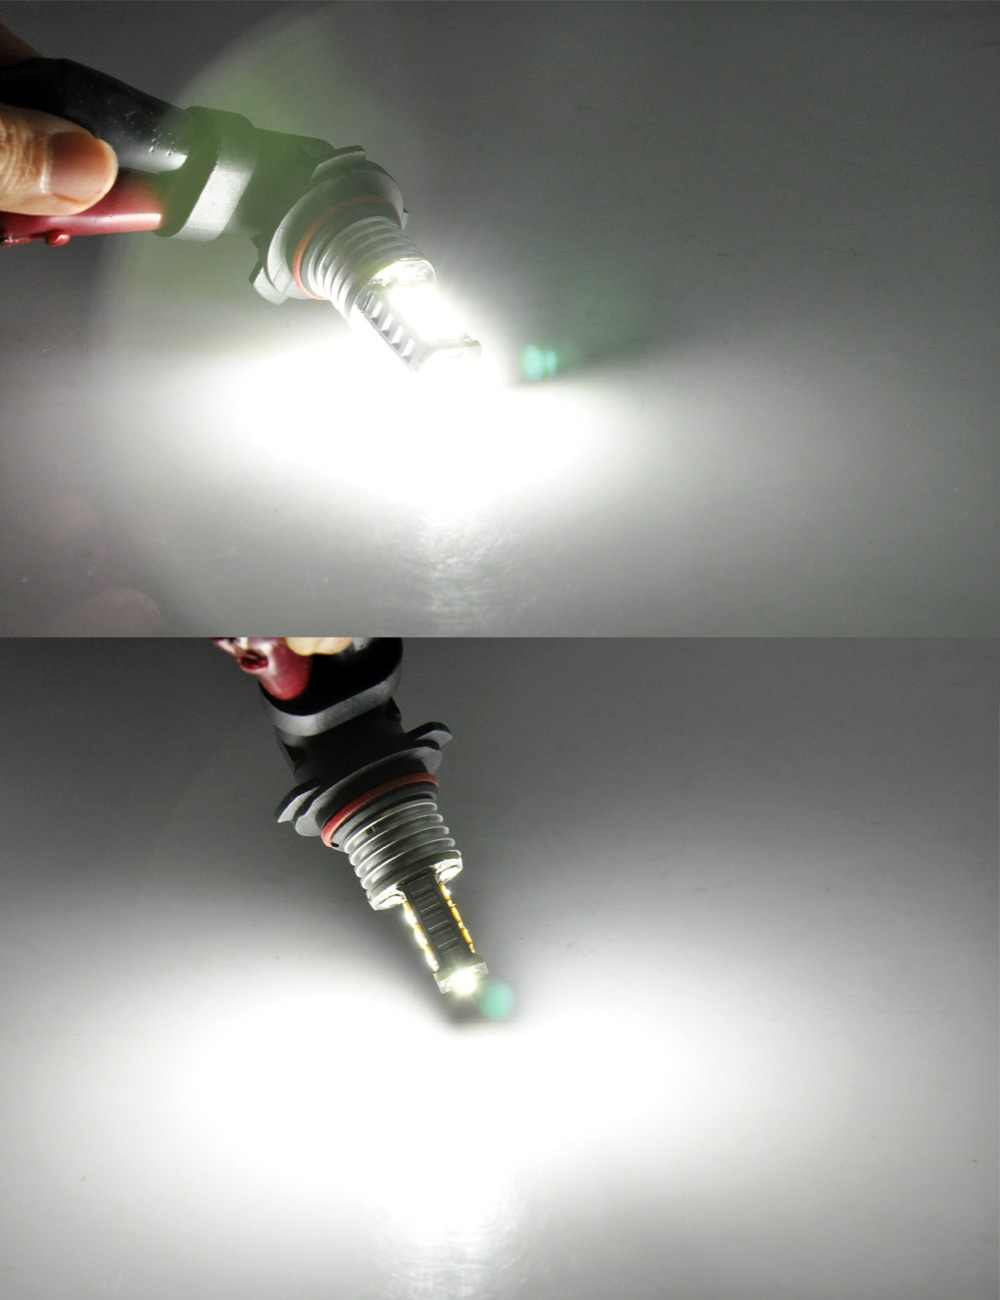 AutoEC 2pcs 9006 hb4 15SMD 2835 LED Bulbs Fog Lights Daytime Running Light Auto Car Head Lamp #LI21